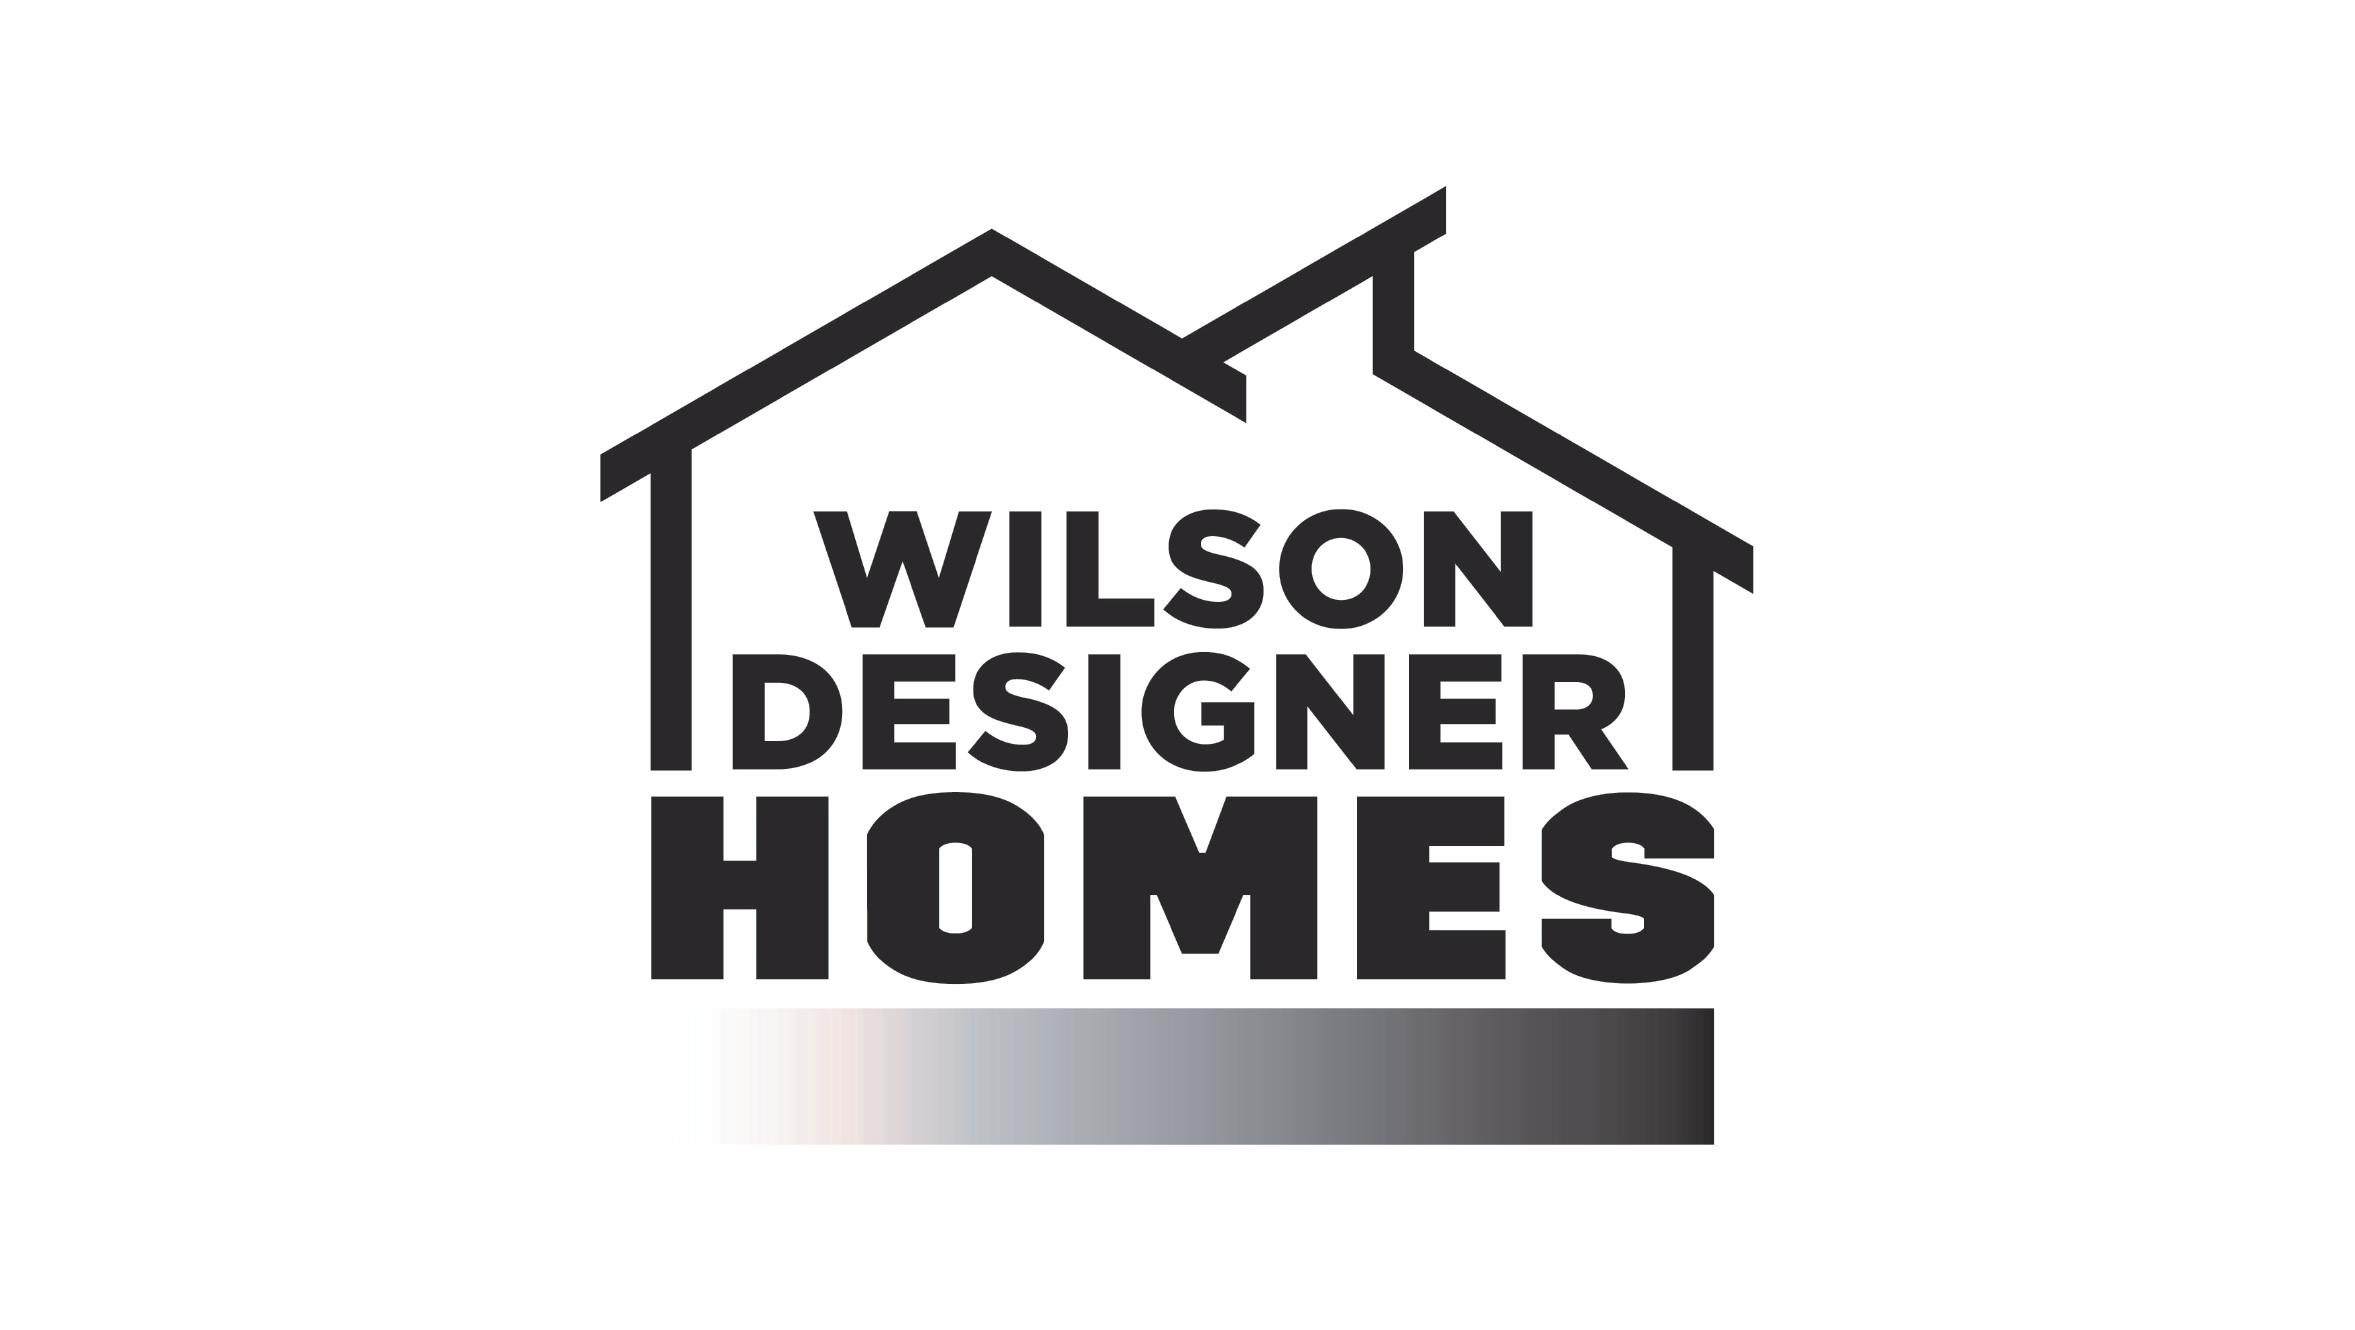 Wilson Designer Homes Limited